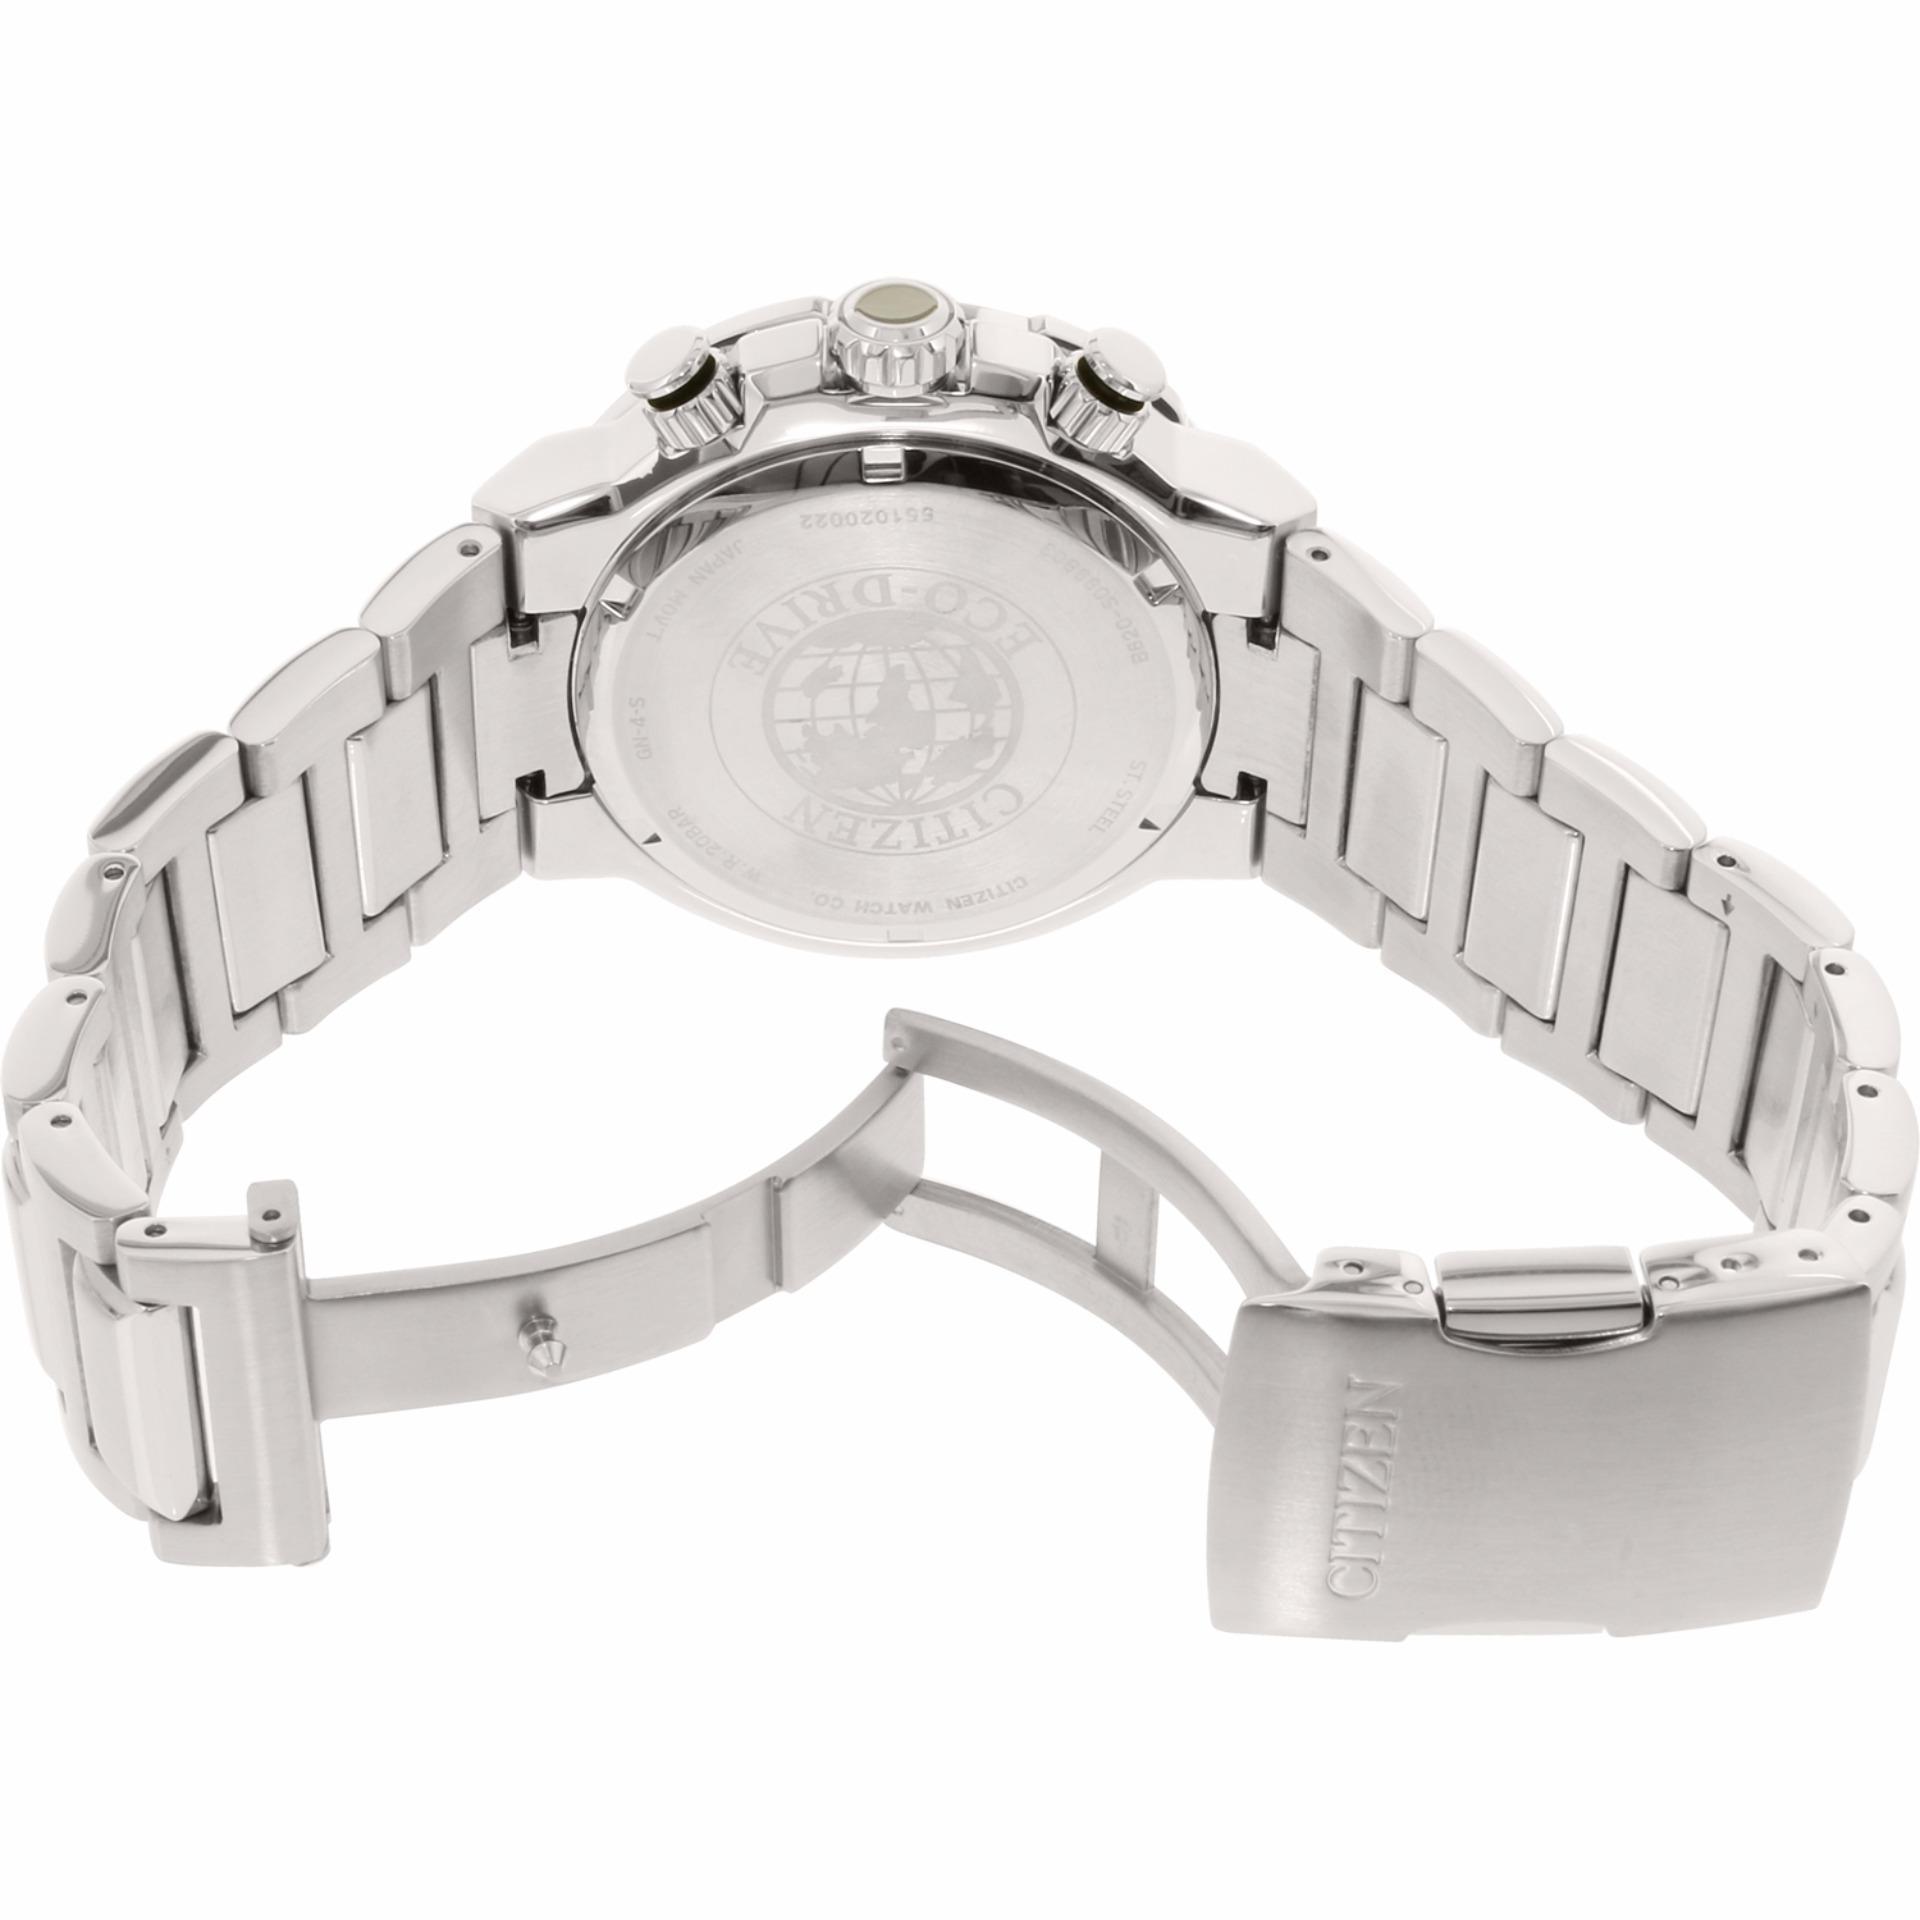 Seiko Chronograph Jam Tangan Pria Silver Stainless Steel 715s 2 Mens Skz285k1 Skz285 Black Automatic Home Page 4